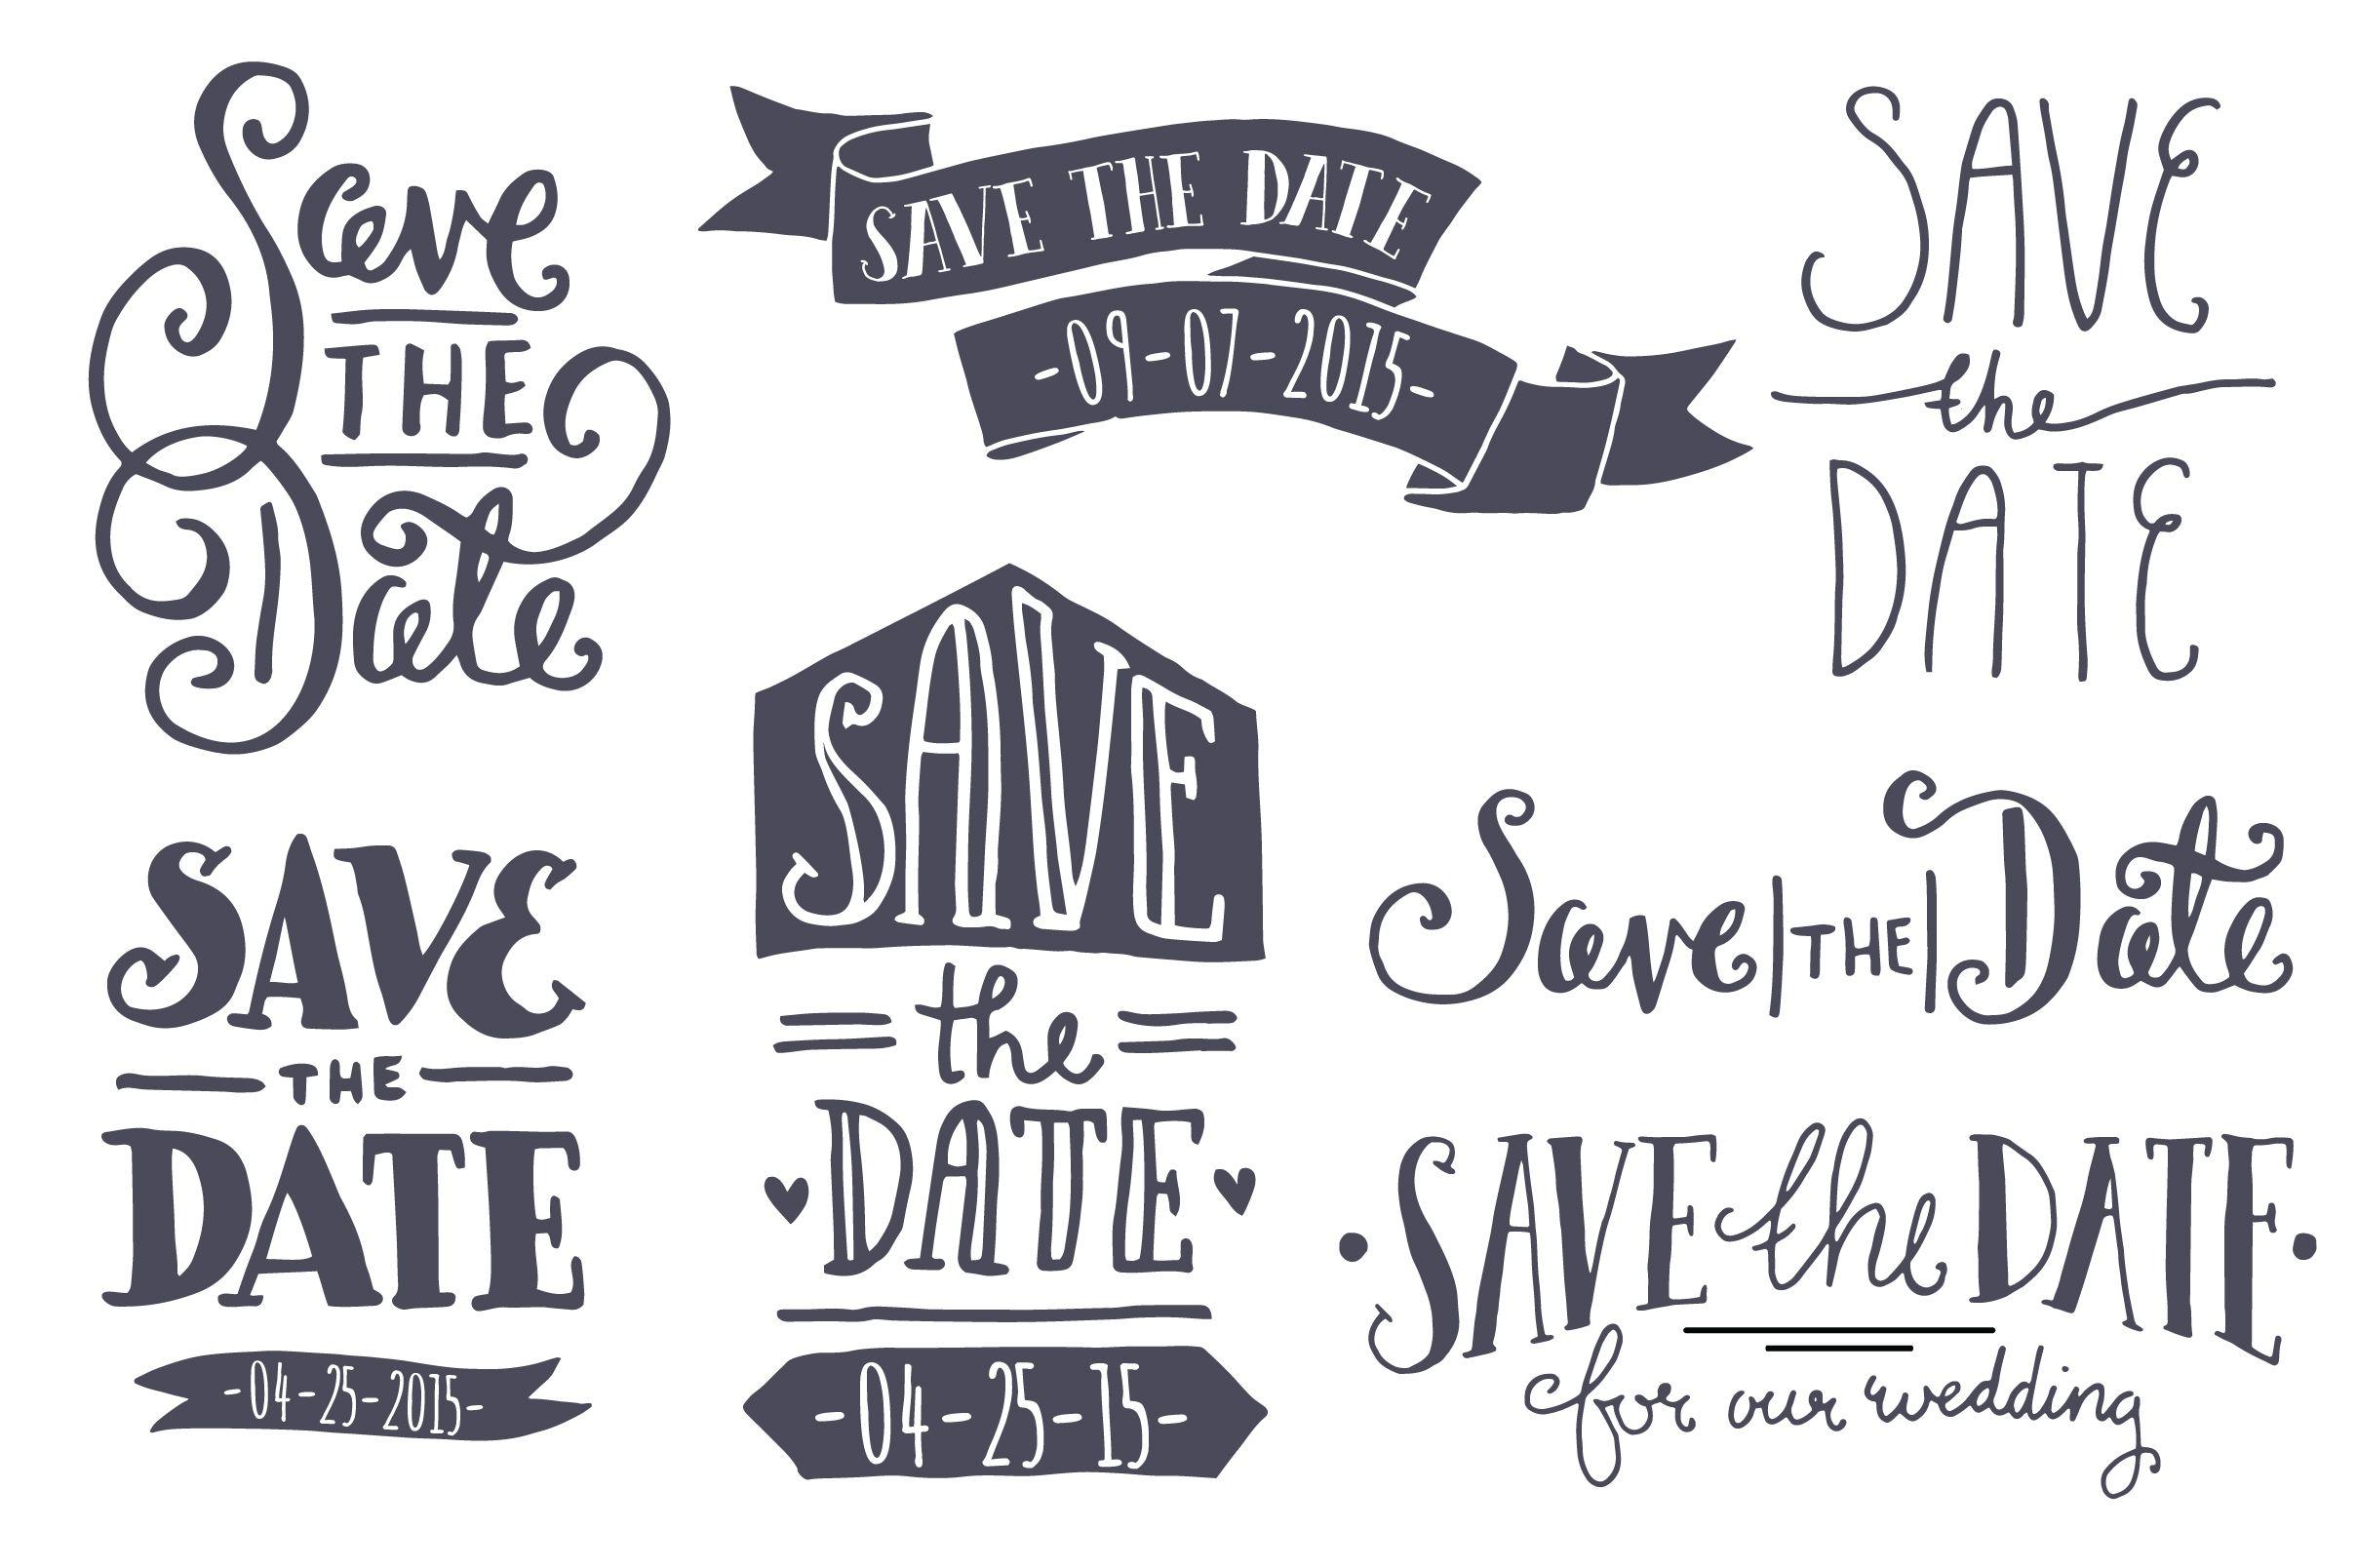 save the date buscar con google wedding plans pinterest save the date save the date. Black Bedroom Furniture Sets. Home Design Ideas